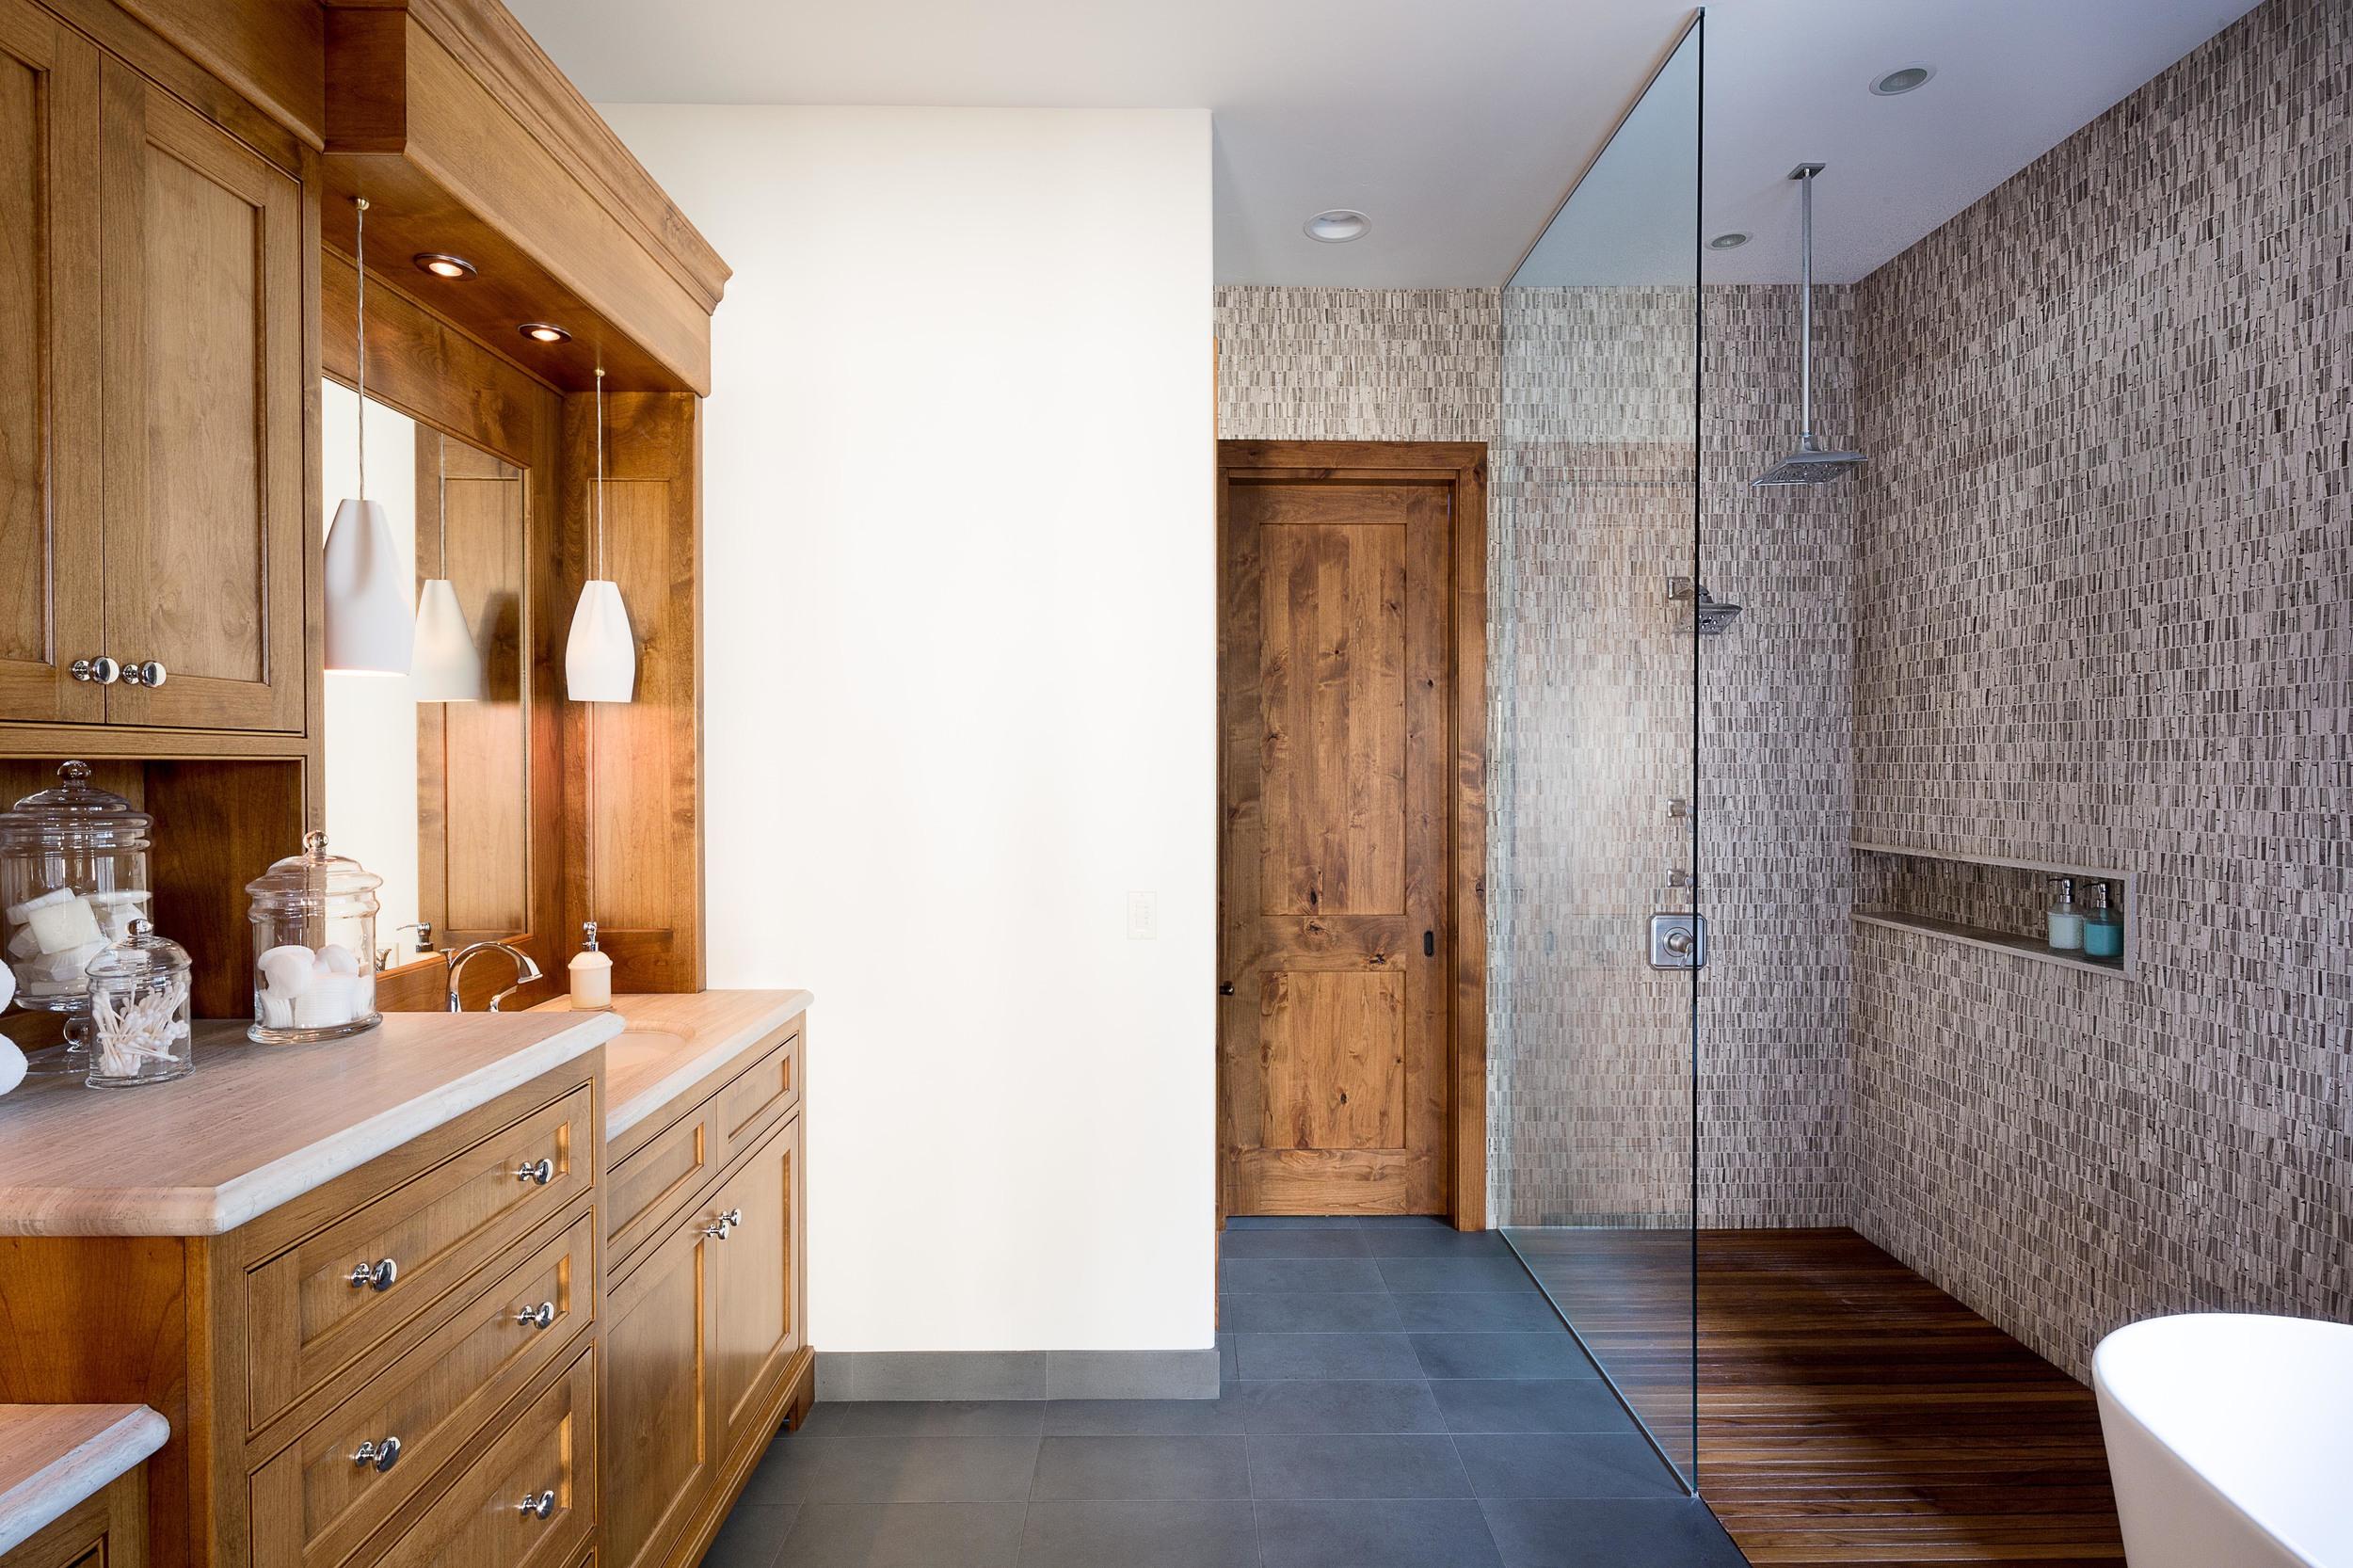 3 Maven_Crosswater_Master_Bathroom_1.jpg